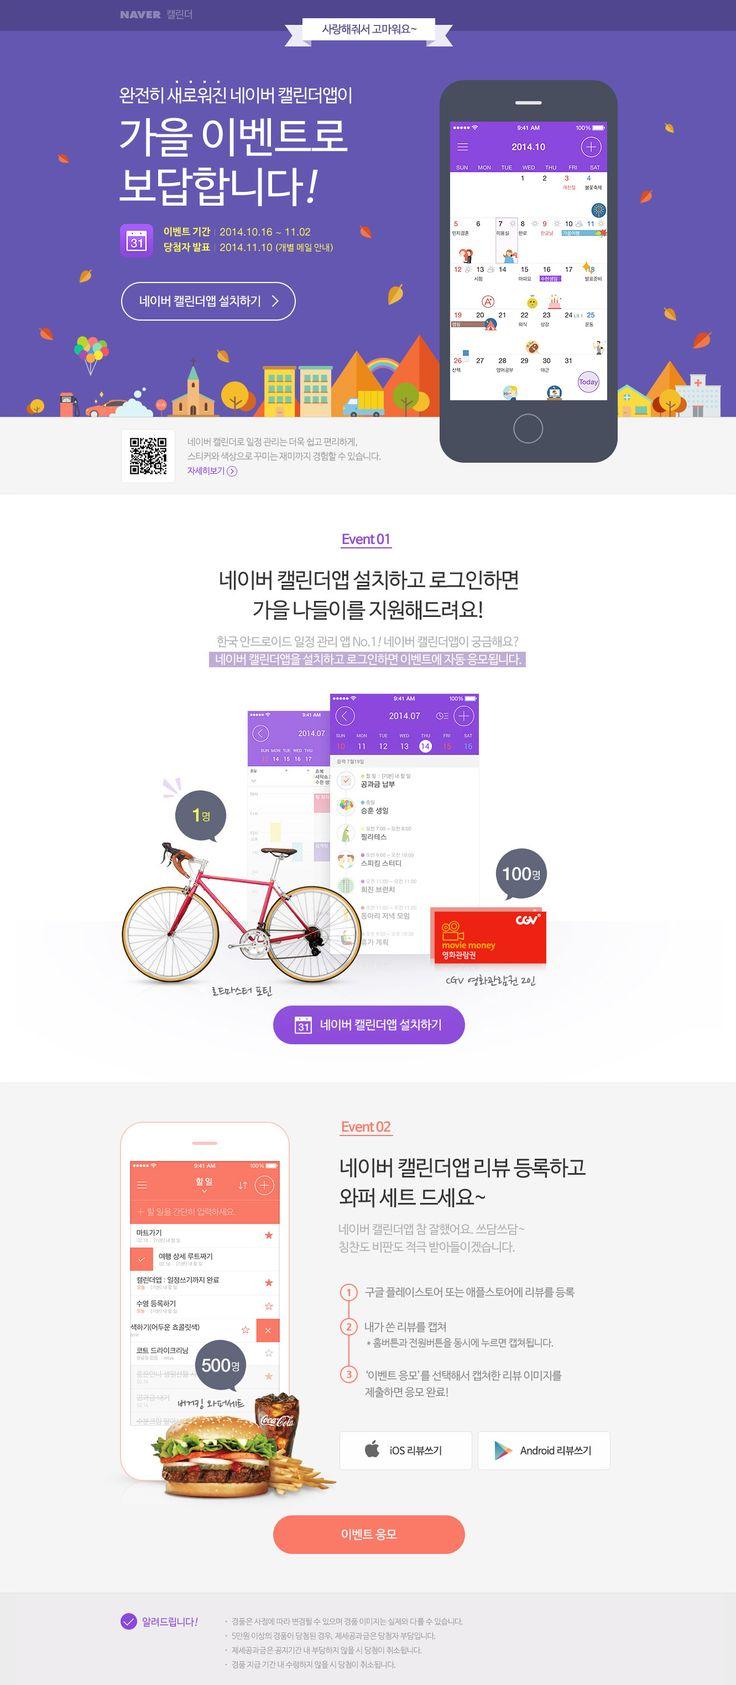 Naver Calender event